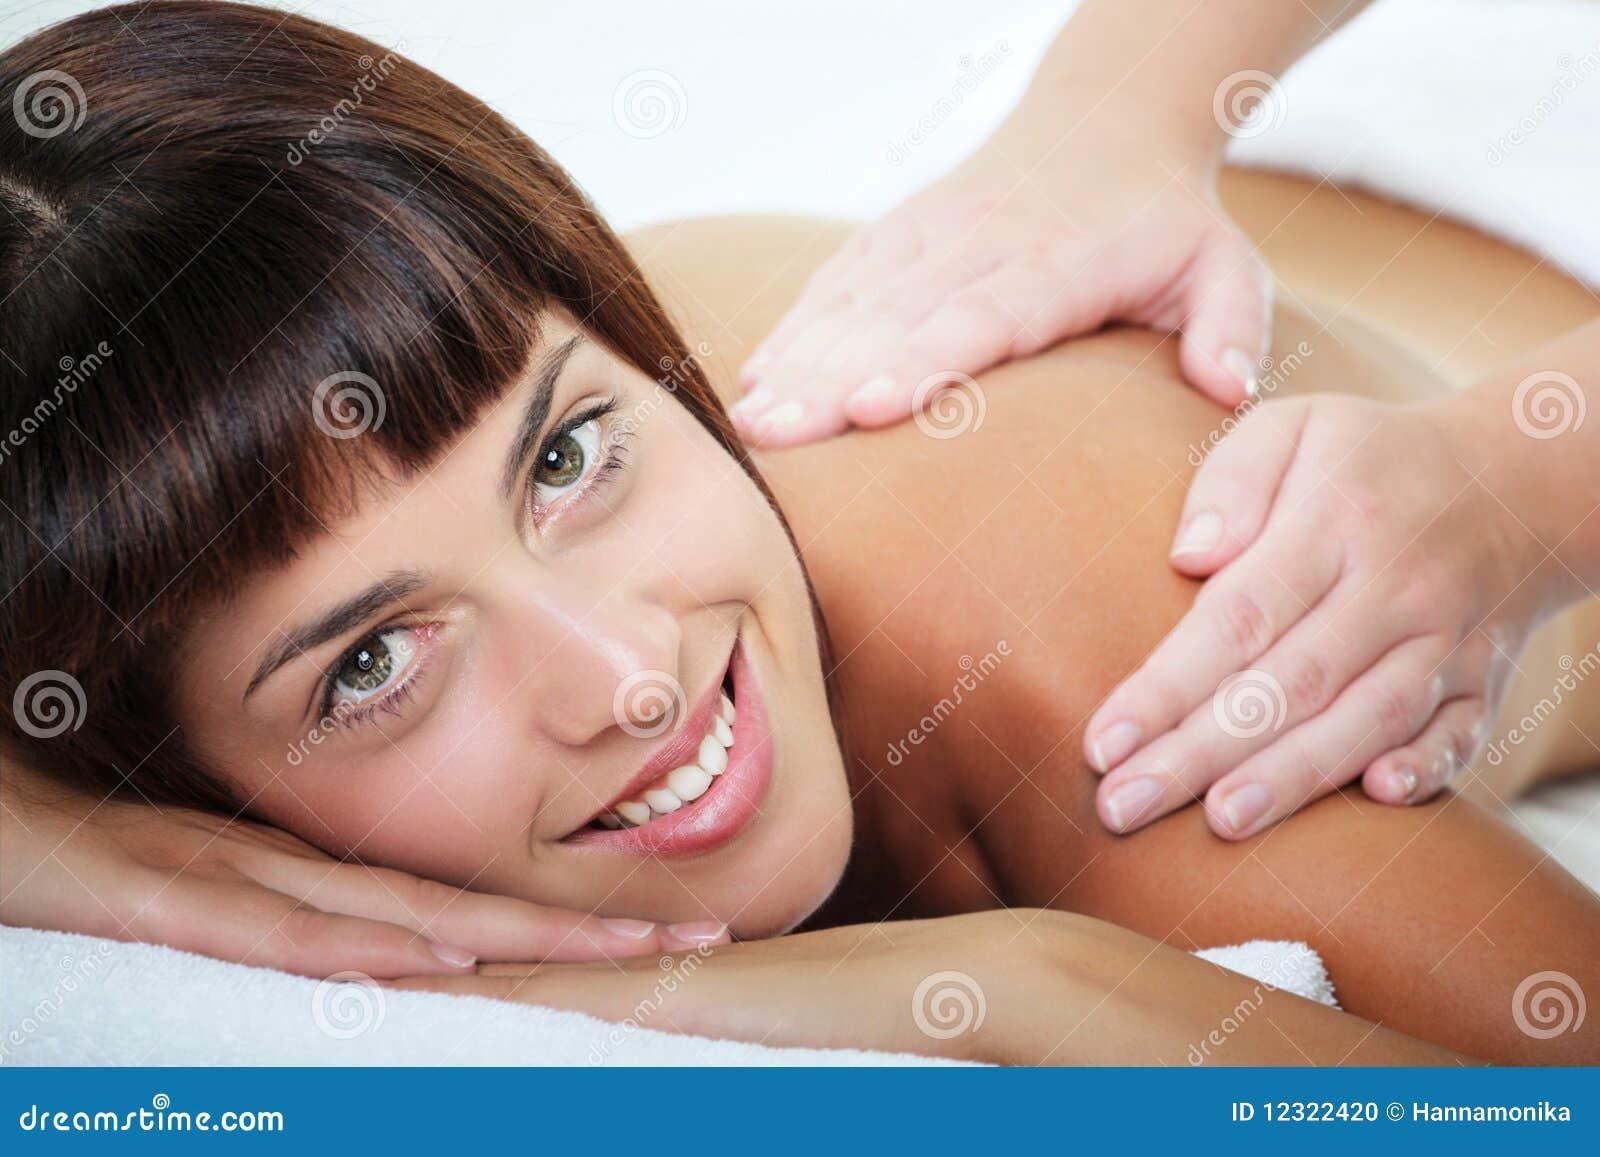 massage sensueel gratis sexnummer